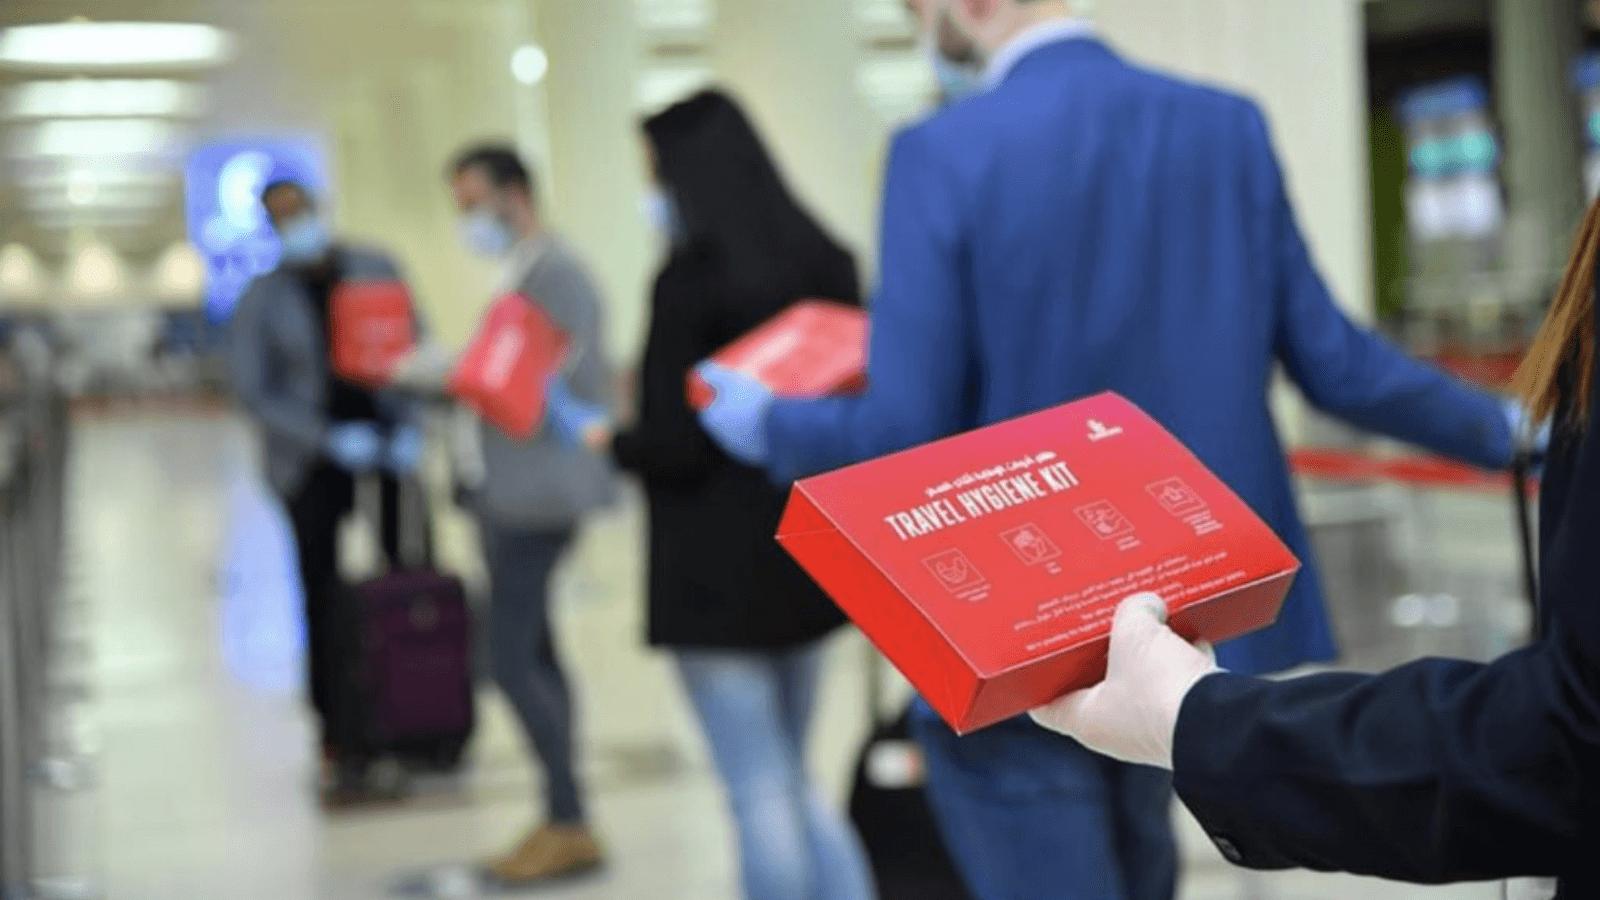 Emirates lanza un 'kit de higiene de viaje' para entregar a todos sus pasajeros a bordo 2